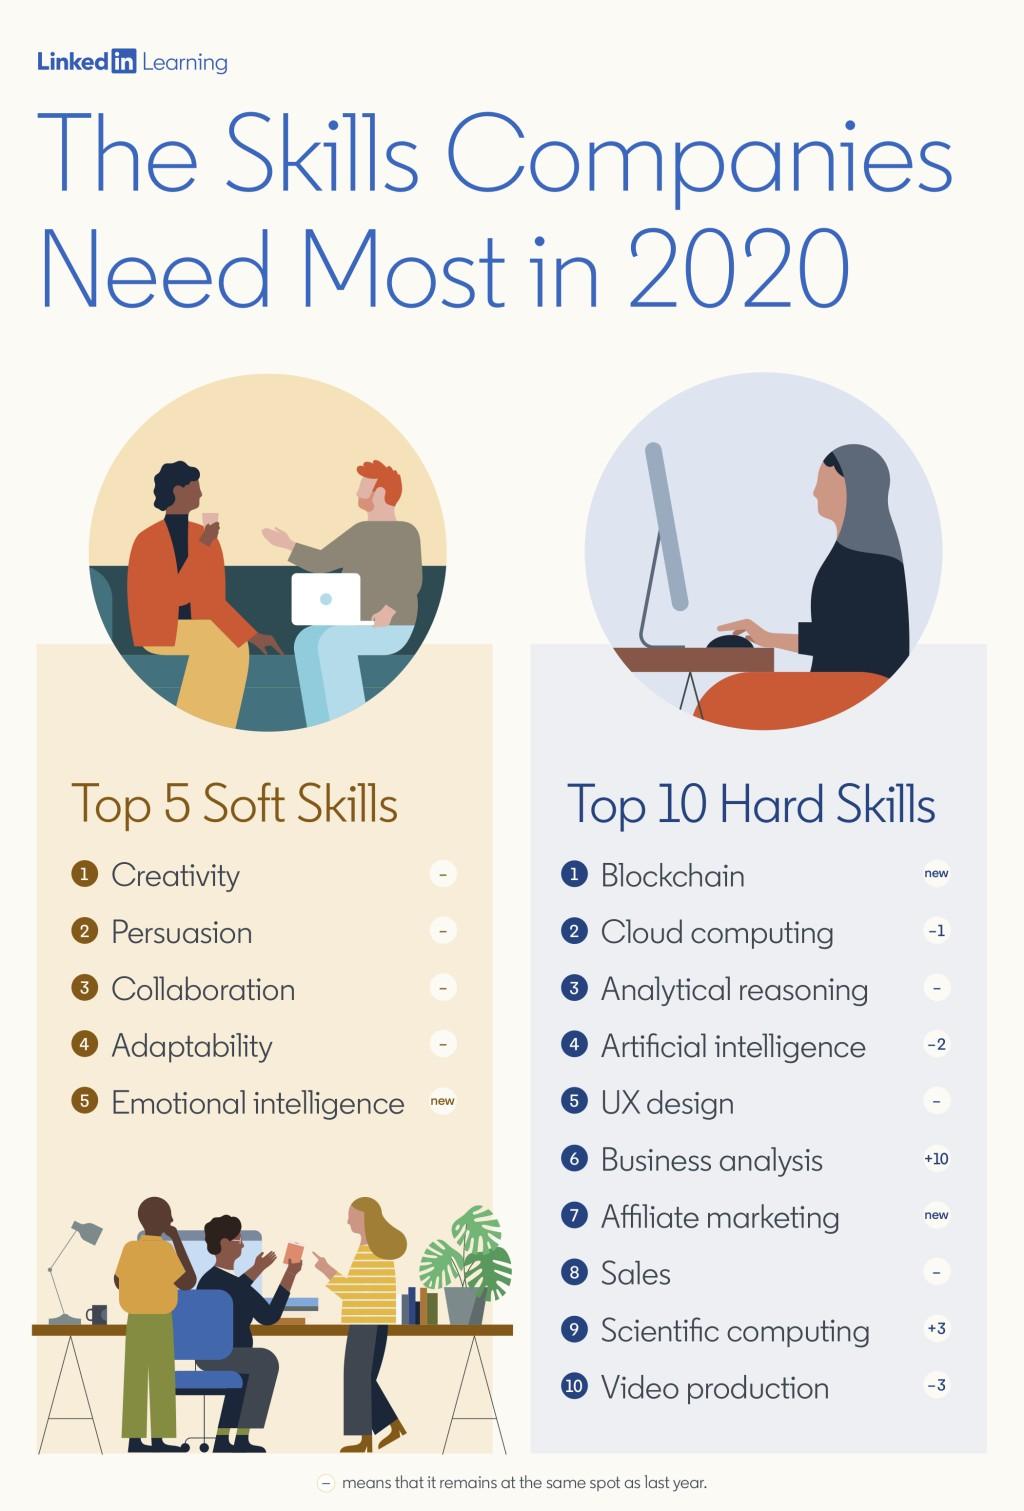 Skills Companies Need Most